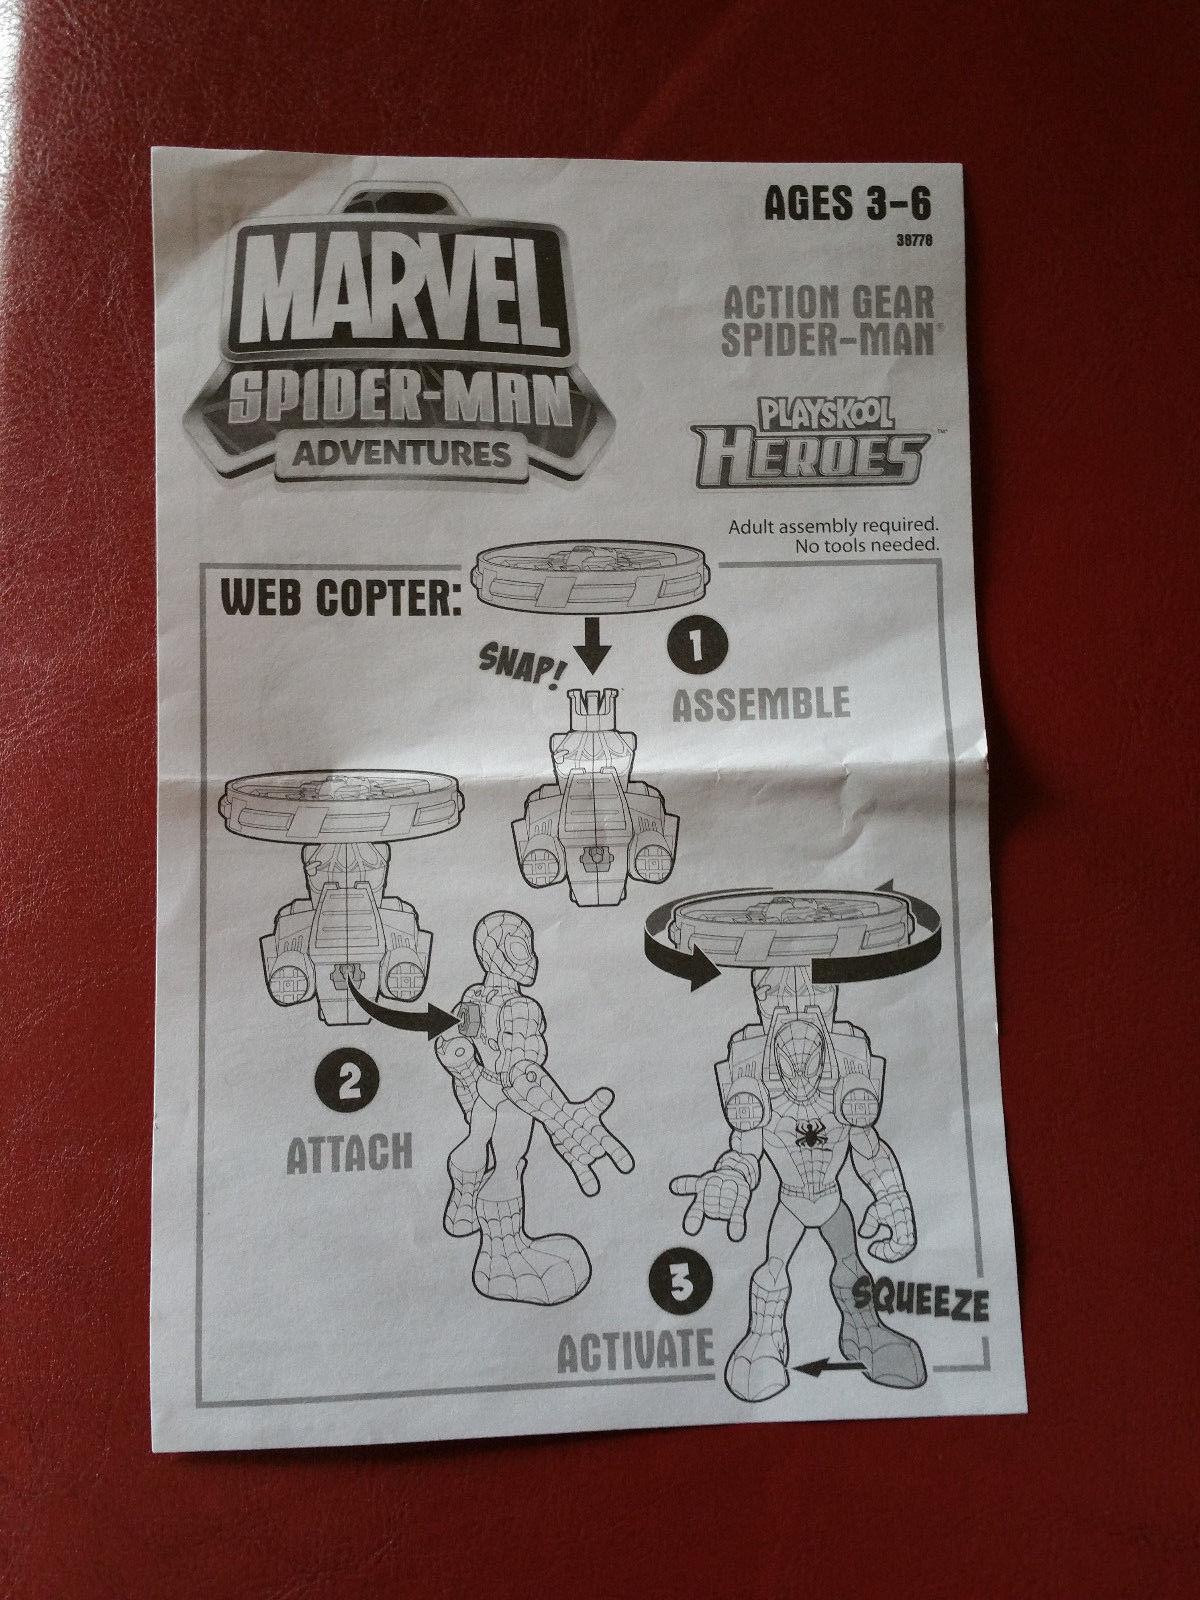 Spider-Man Marvel Playskool Heroes Action Gear Copter Jetpack Climb CMPLT w/Inst